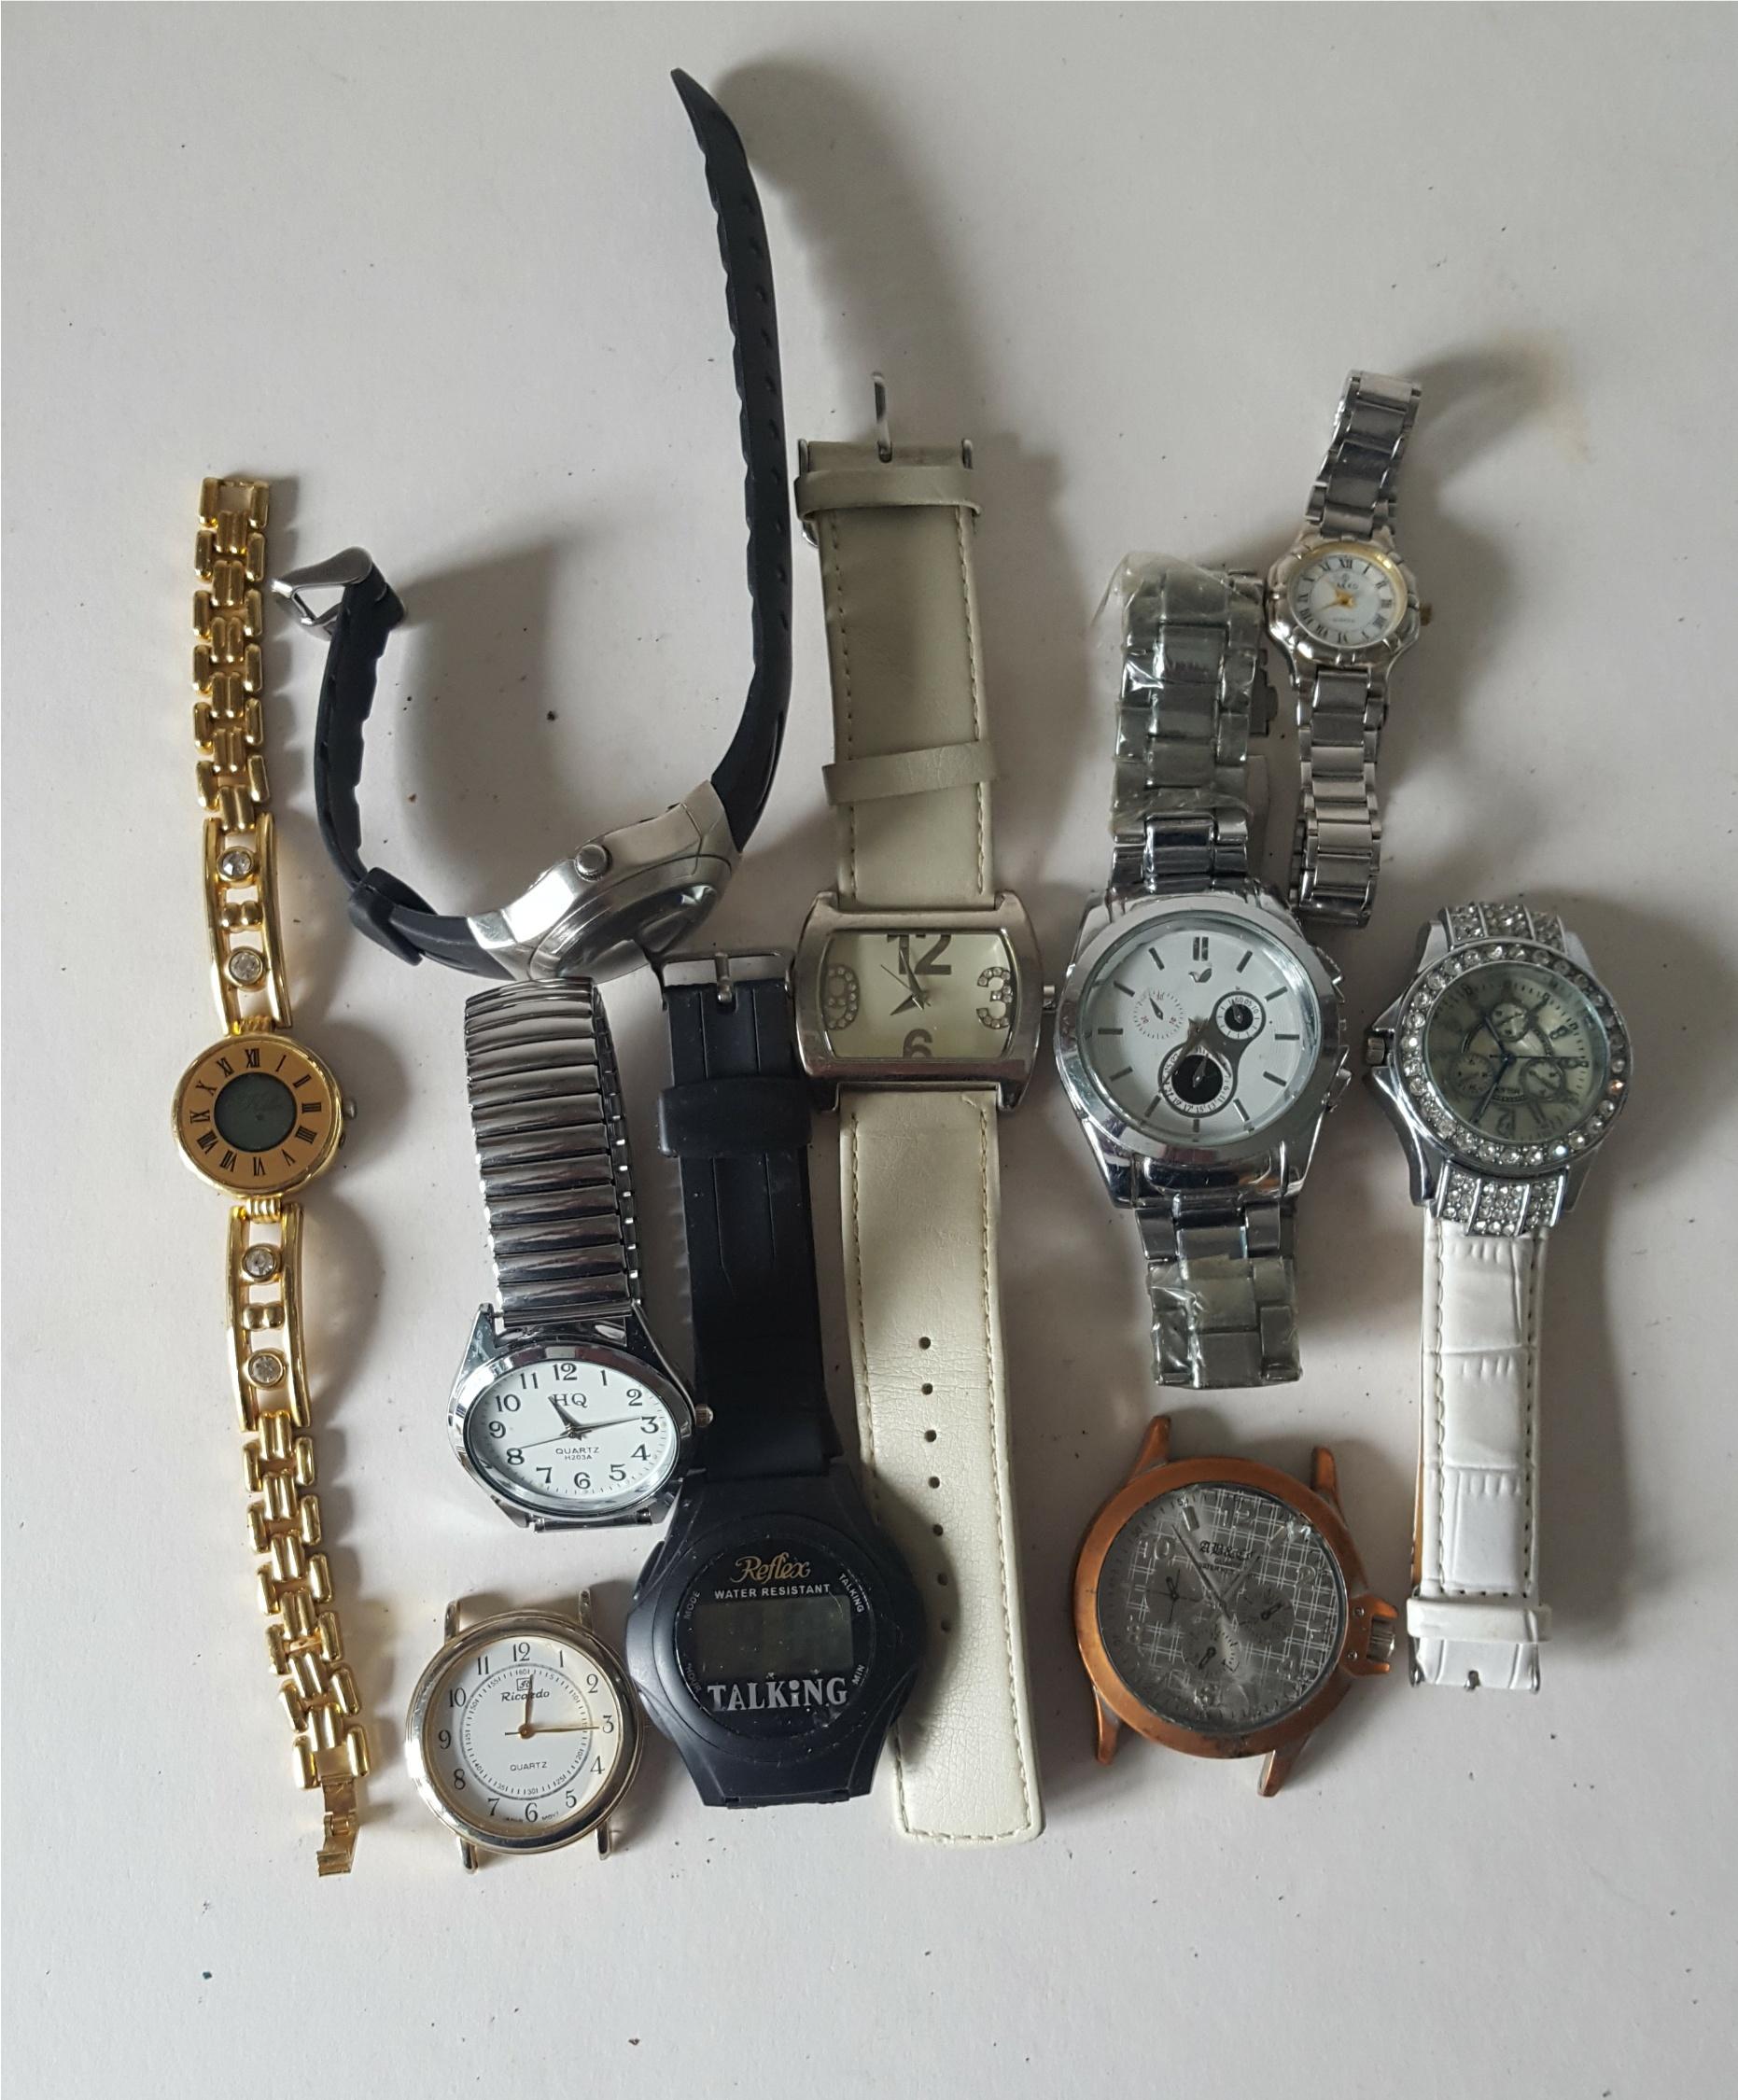 Lot 85 - Vintage Retro Parcel of 10 Assorted Wrist Watches NO RESERVE